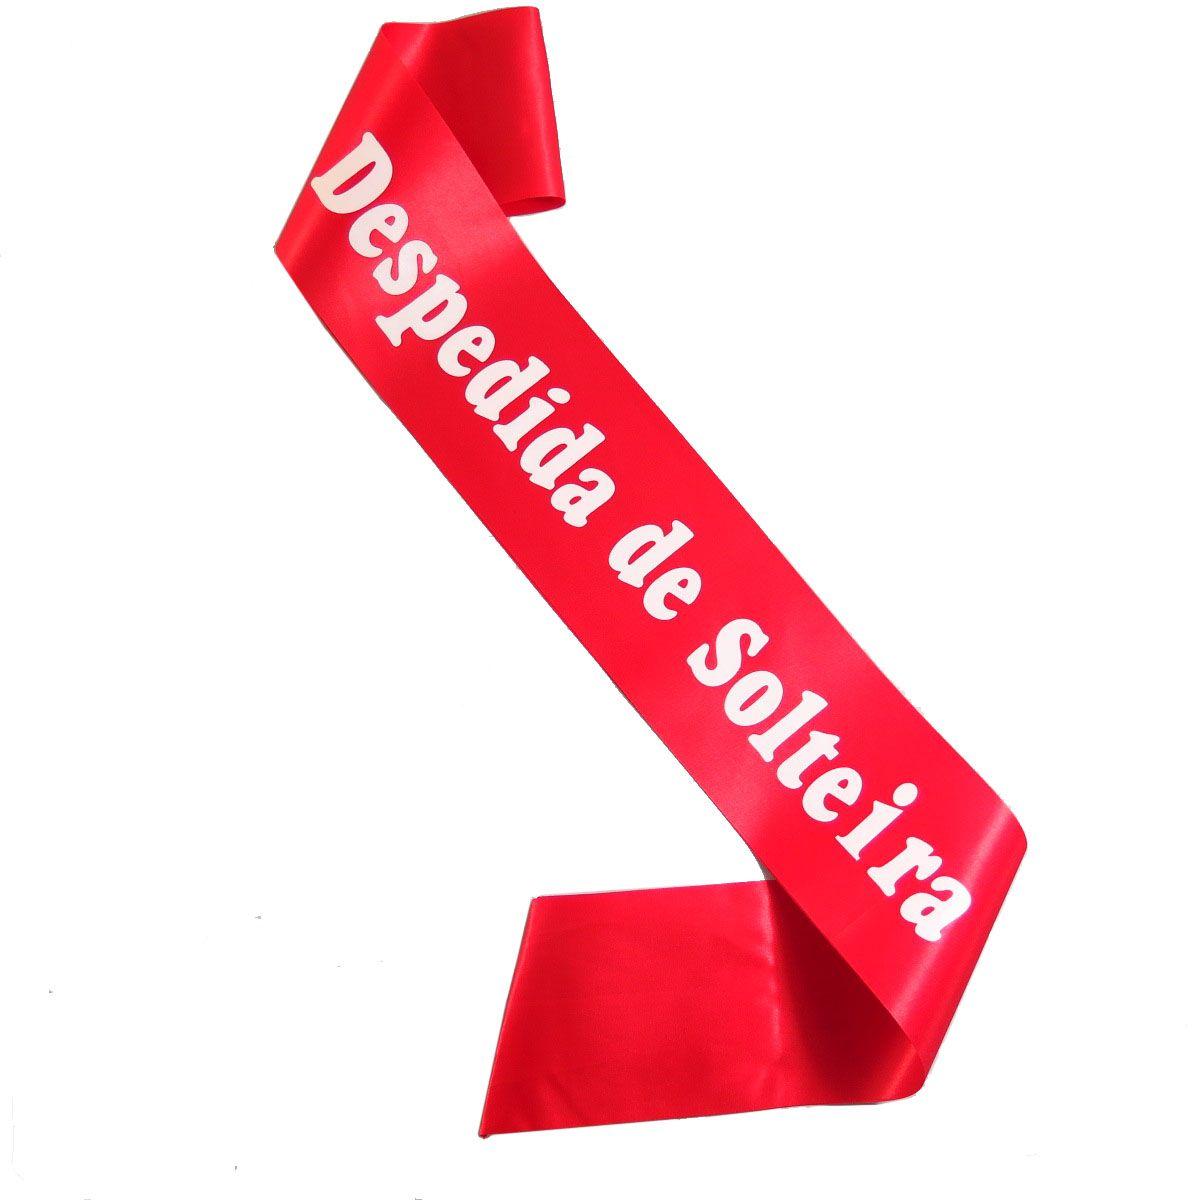 12pcs Despedida de solteira sash portuguese bachelorette party Purple pink red black blue satin ribbon bridal shower party